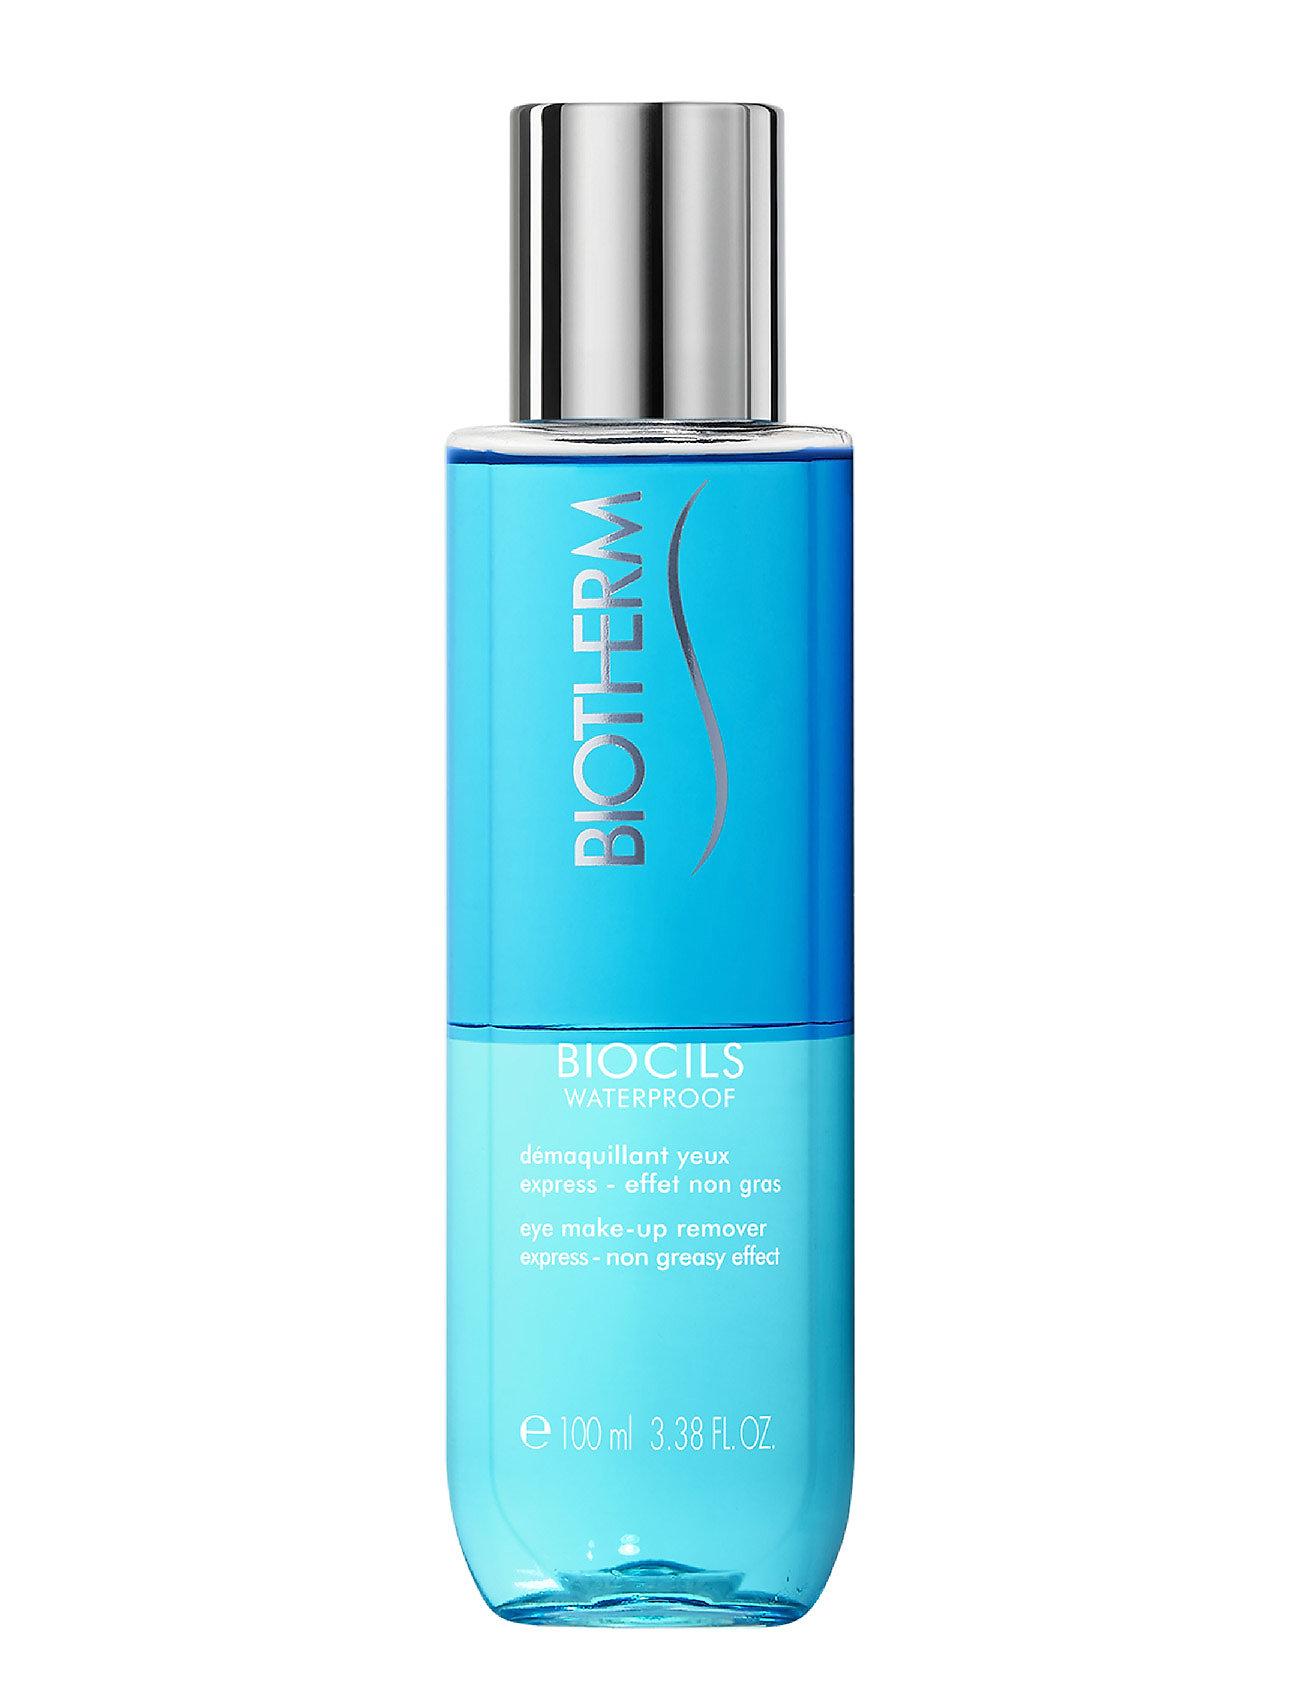 Biocils waterproof makeup remover 100 ml fra biotherm fra boozt.com dk